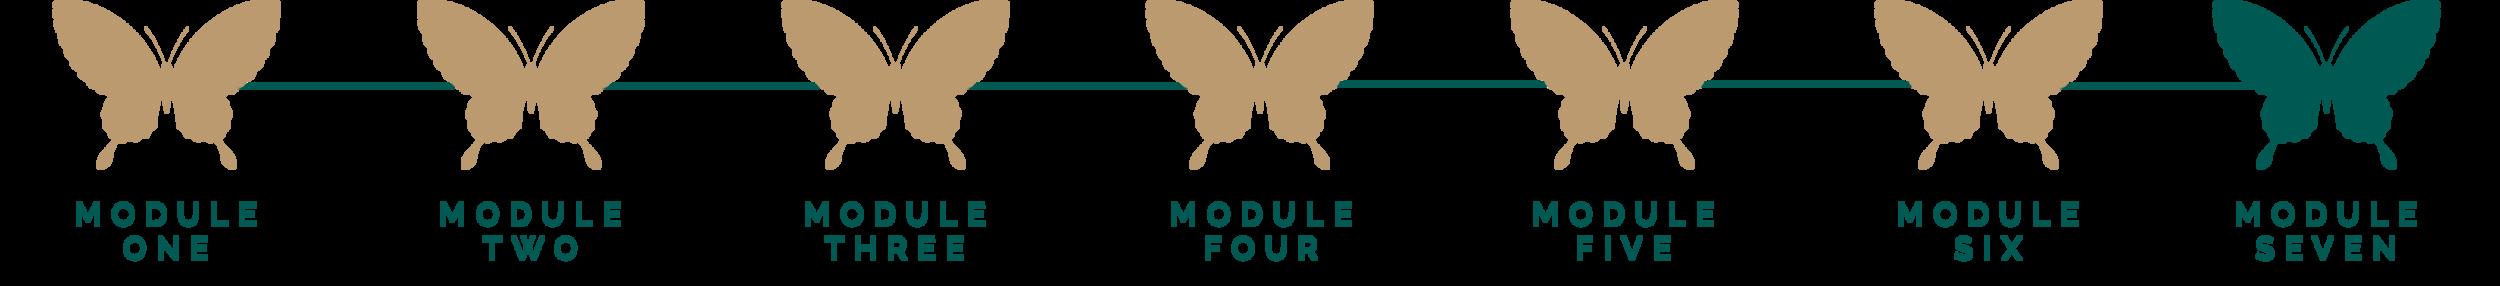 Module 6.7.png